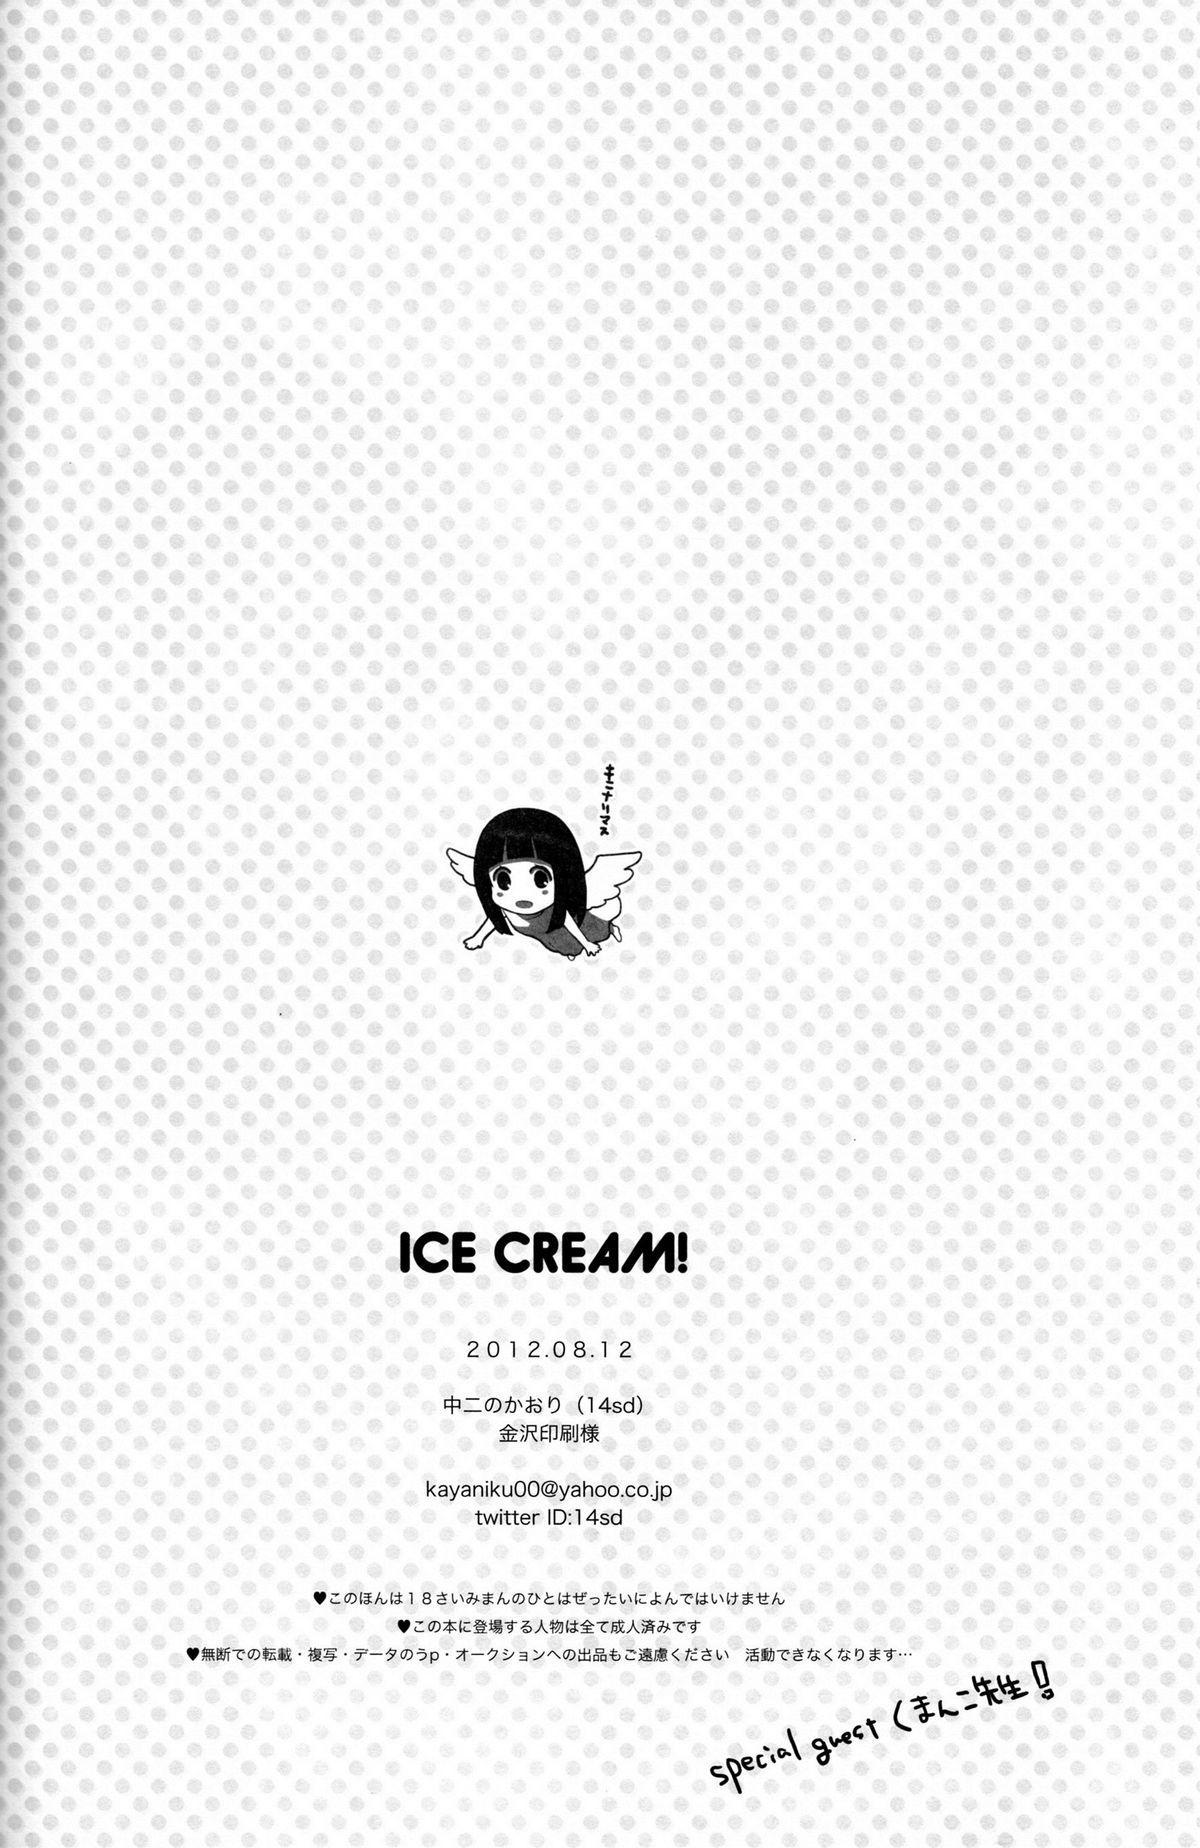 ICE CREAM! 28